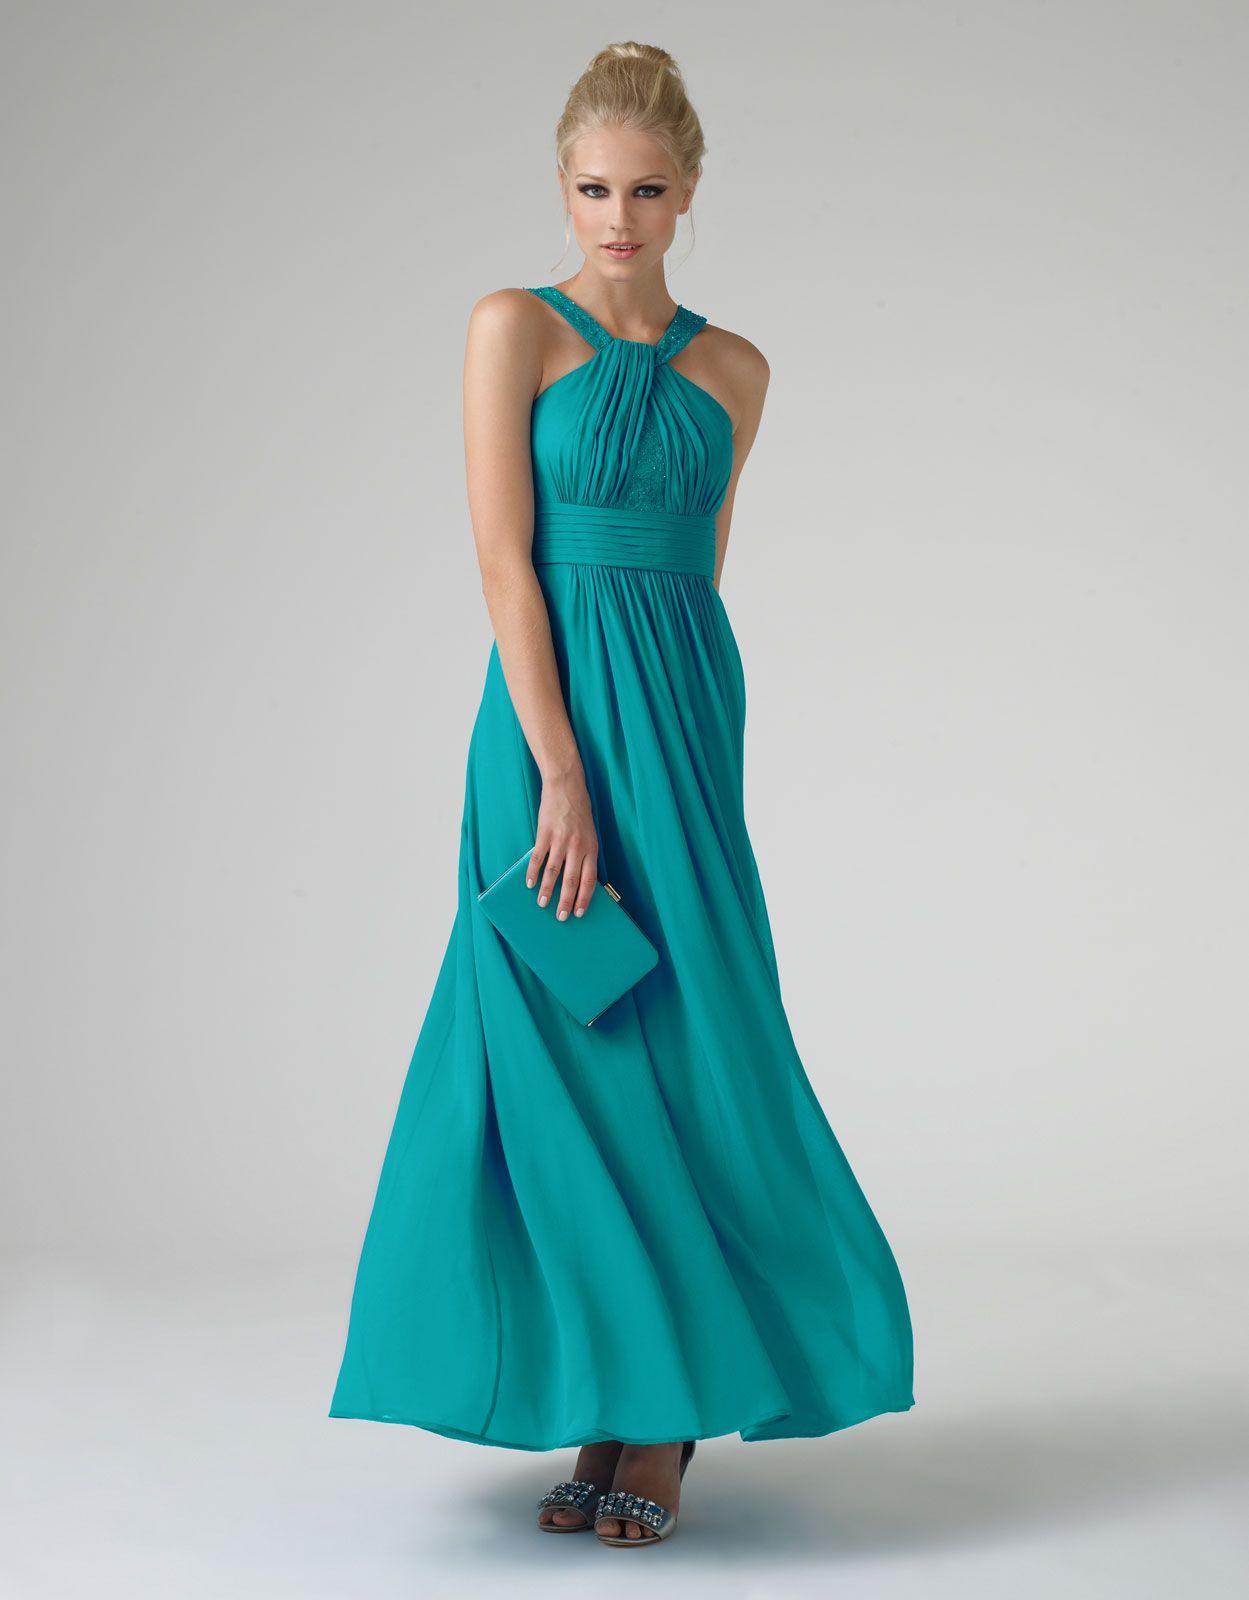 2/18/15 Brand/Designer: Monsoon Material: Chiffon /Silk Occasion ...